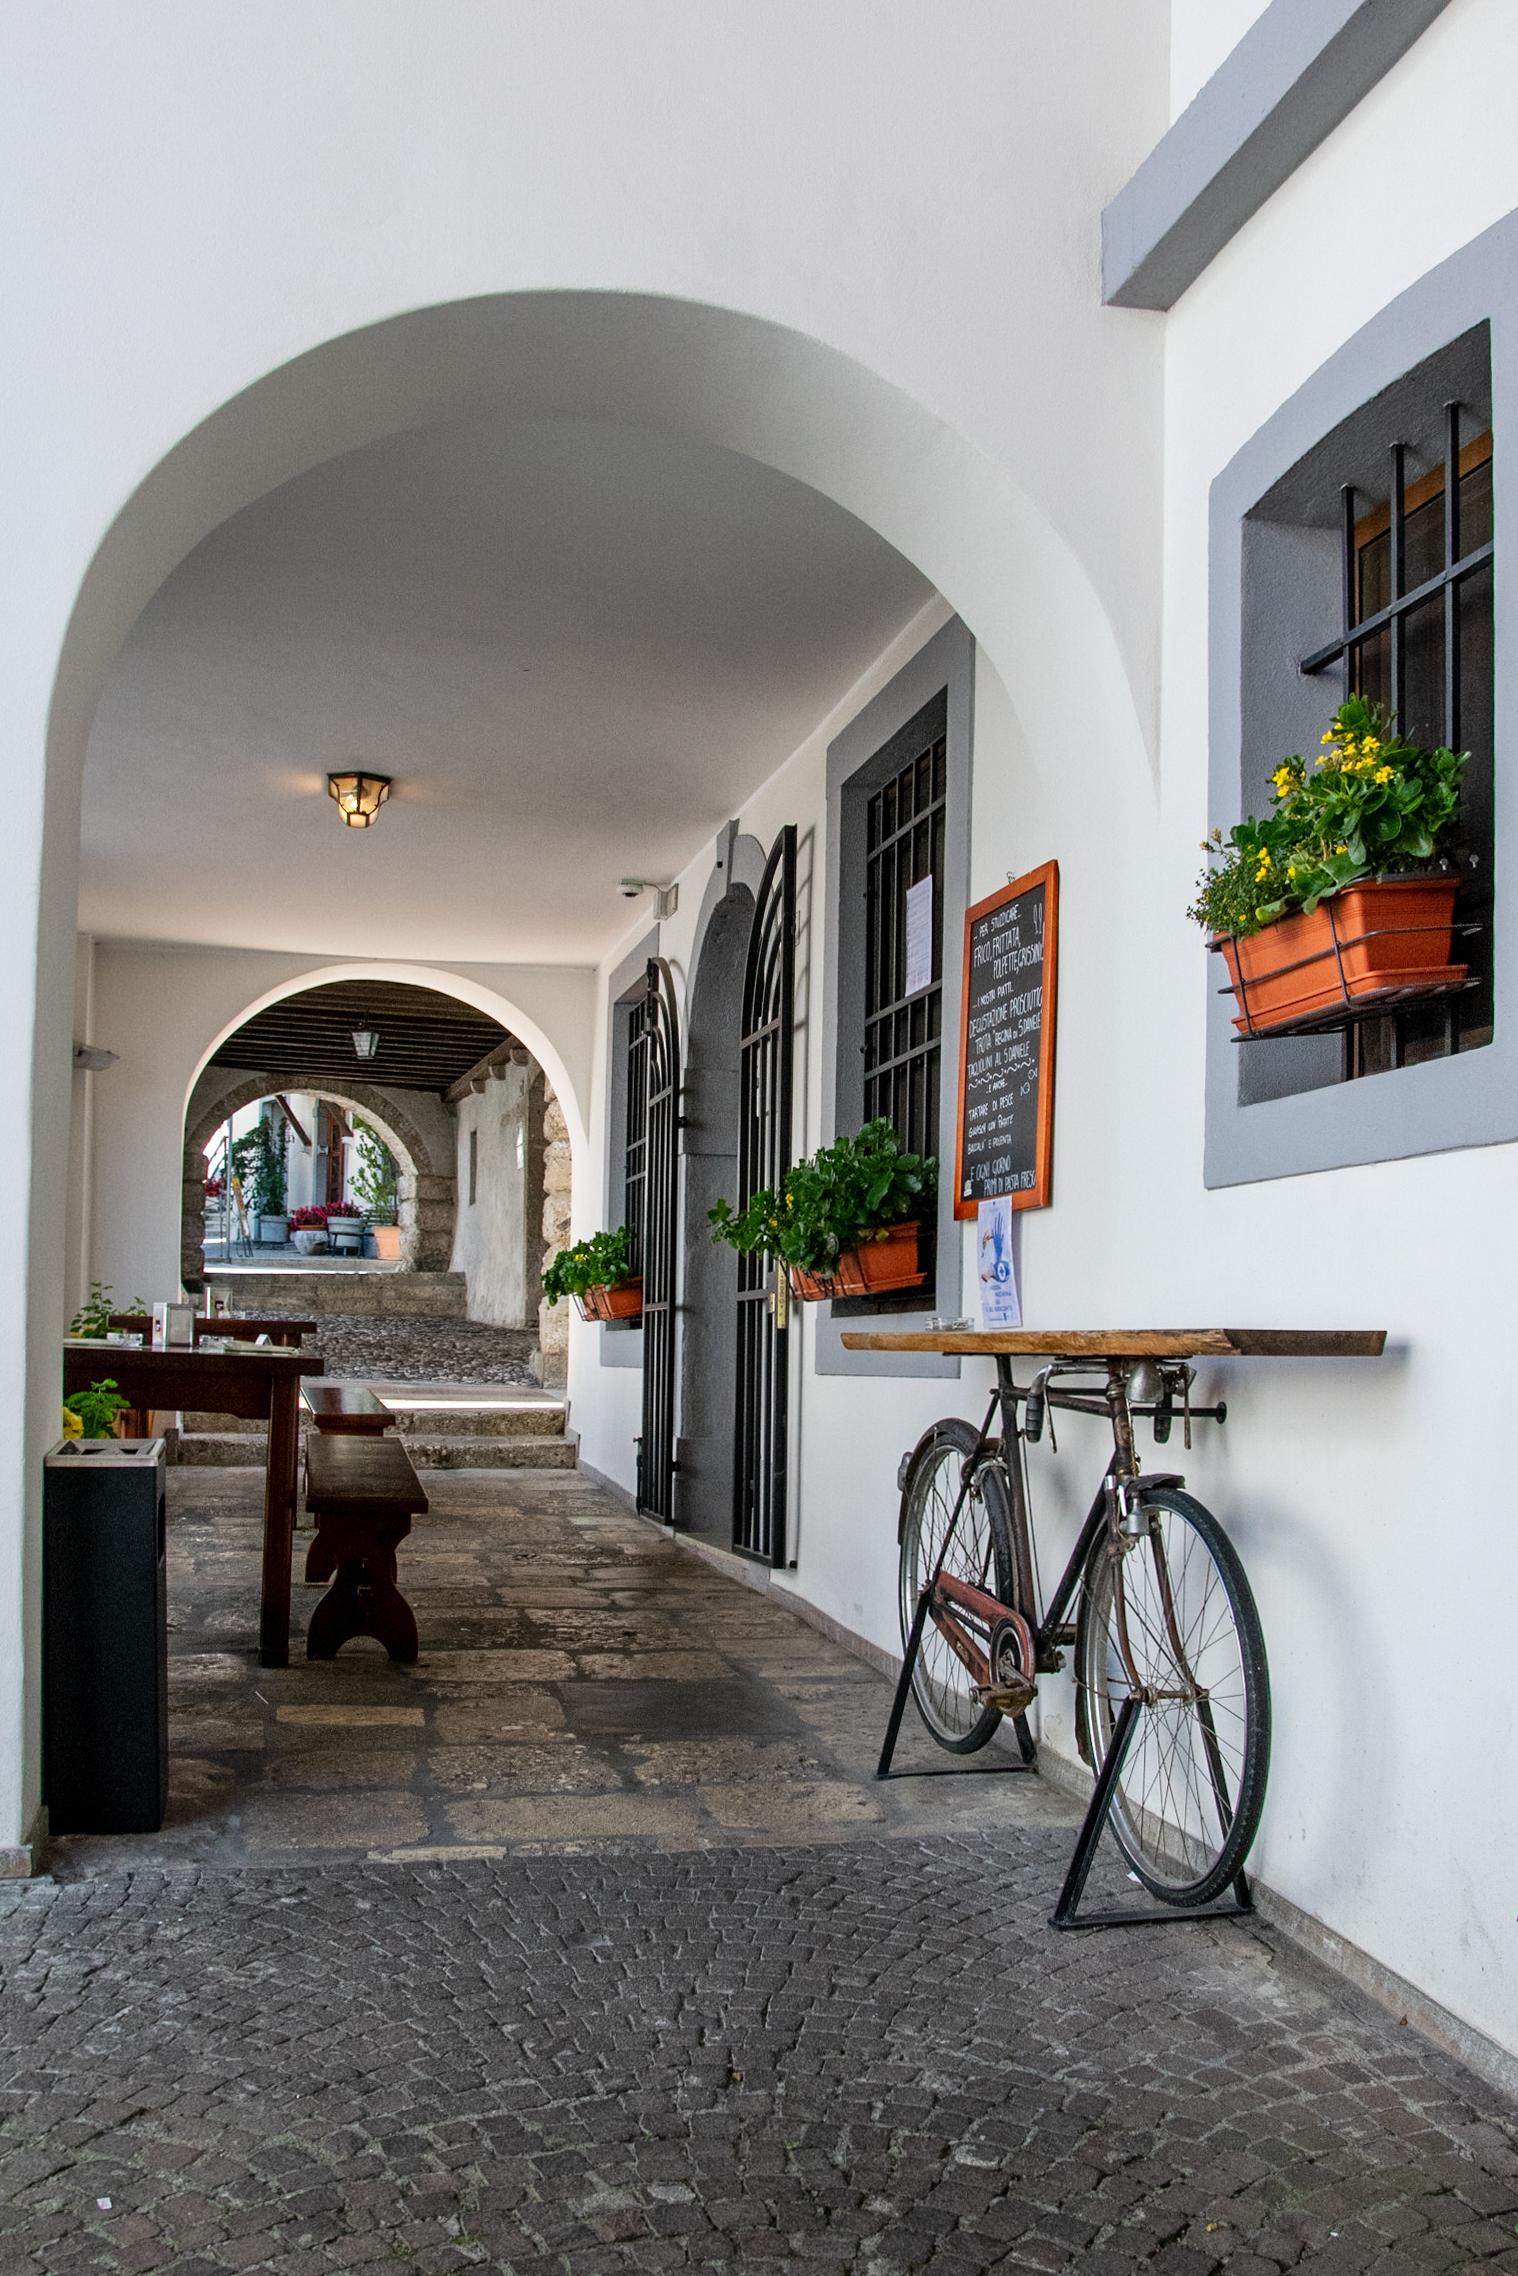 Al Bersagliere - San Daniele del Friuli